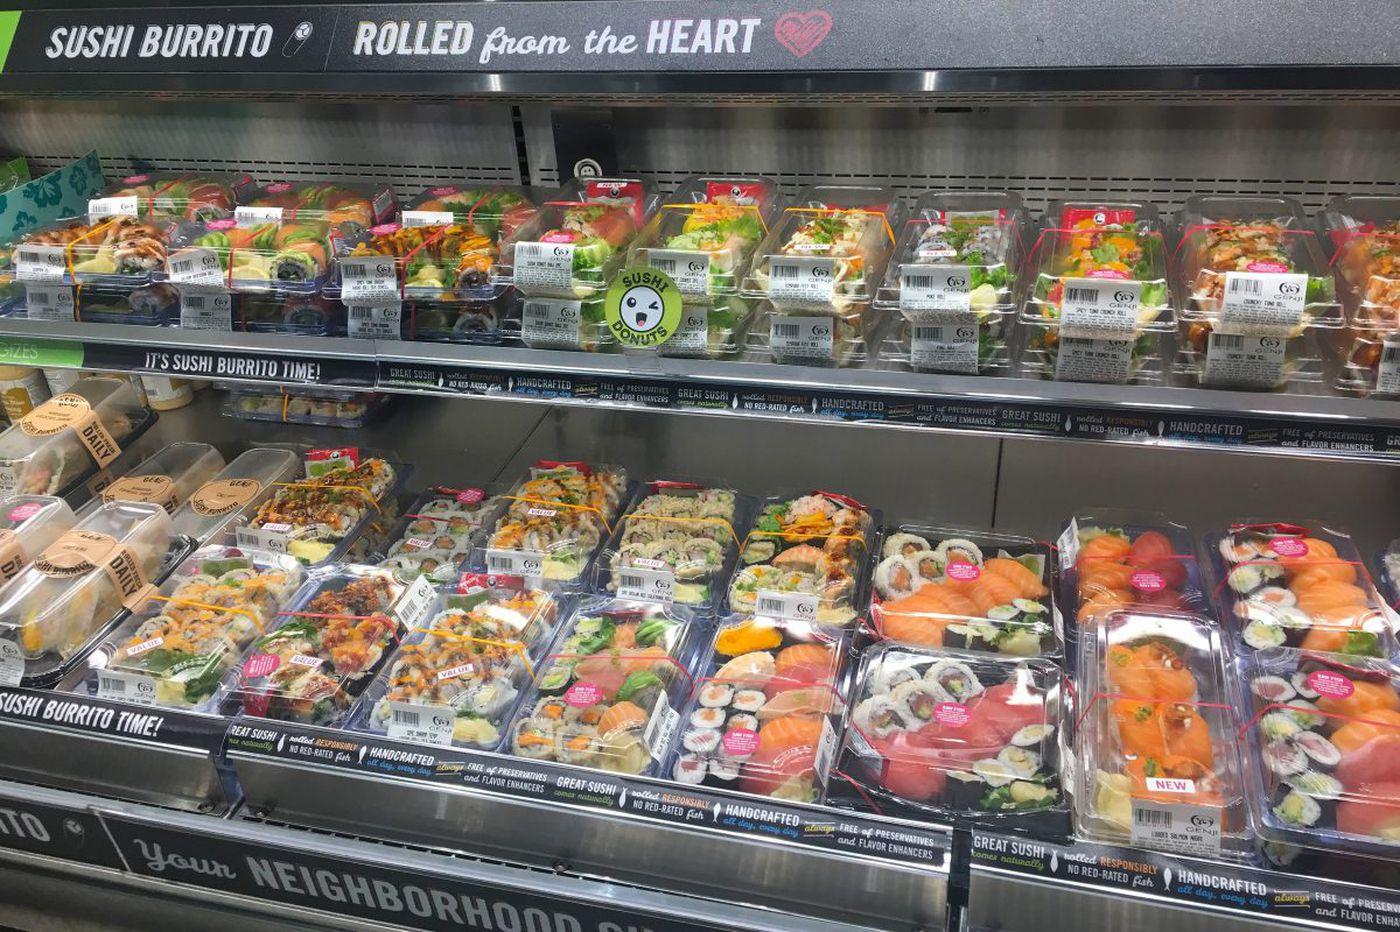 Genji to open izakaya in further shakeup of Whole Foods restaurant row